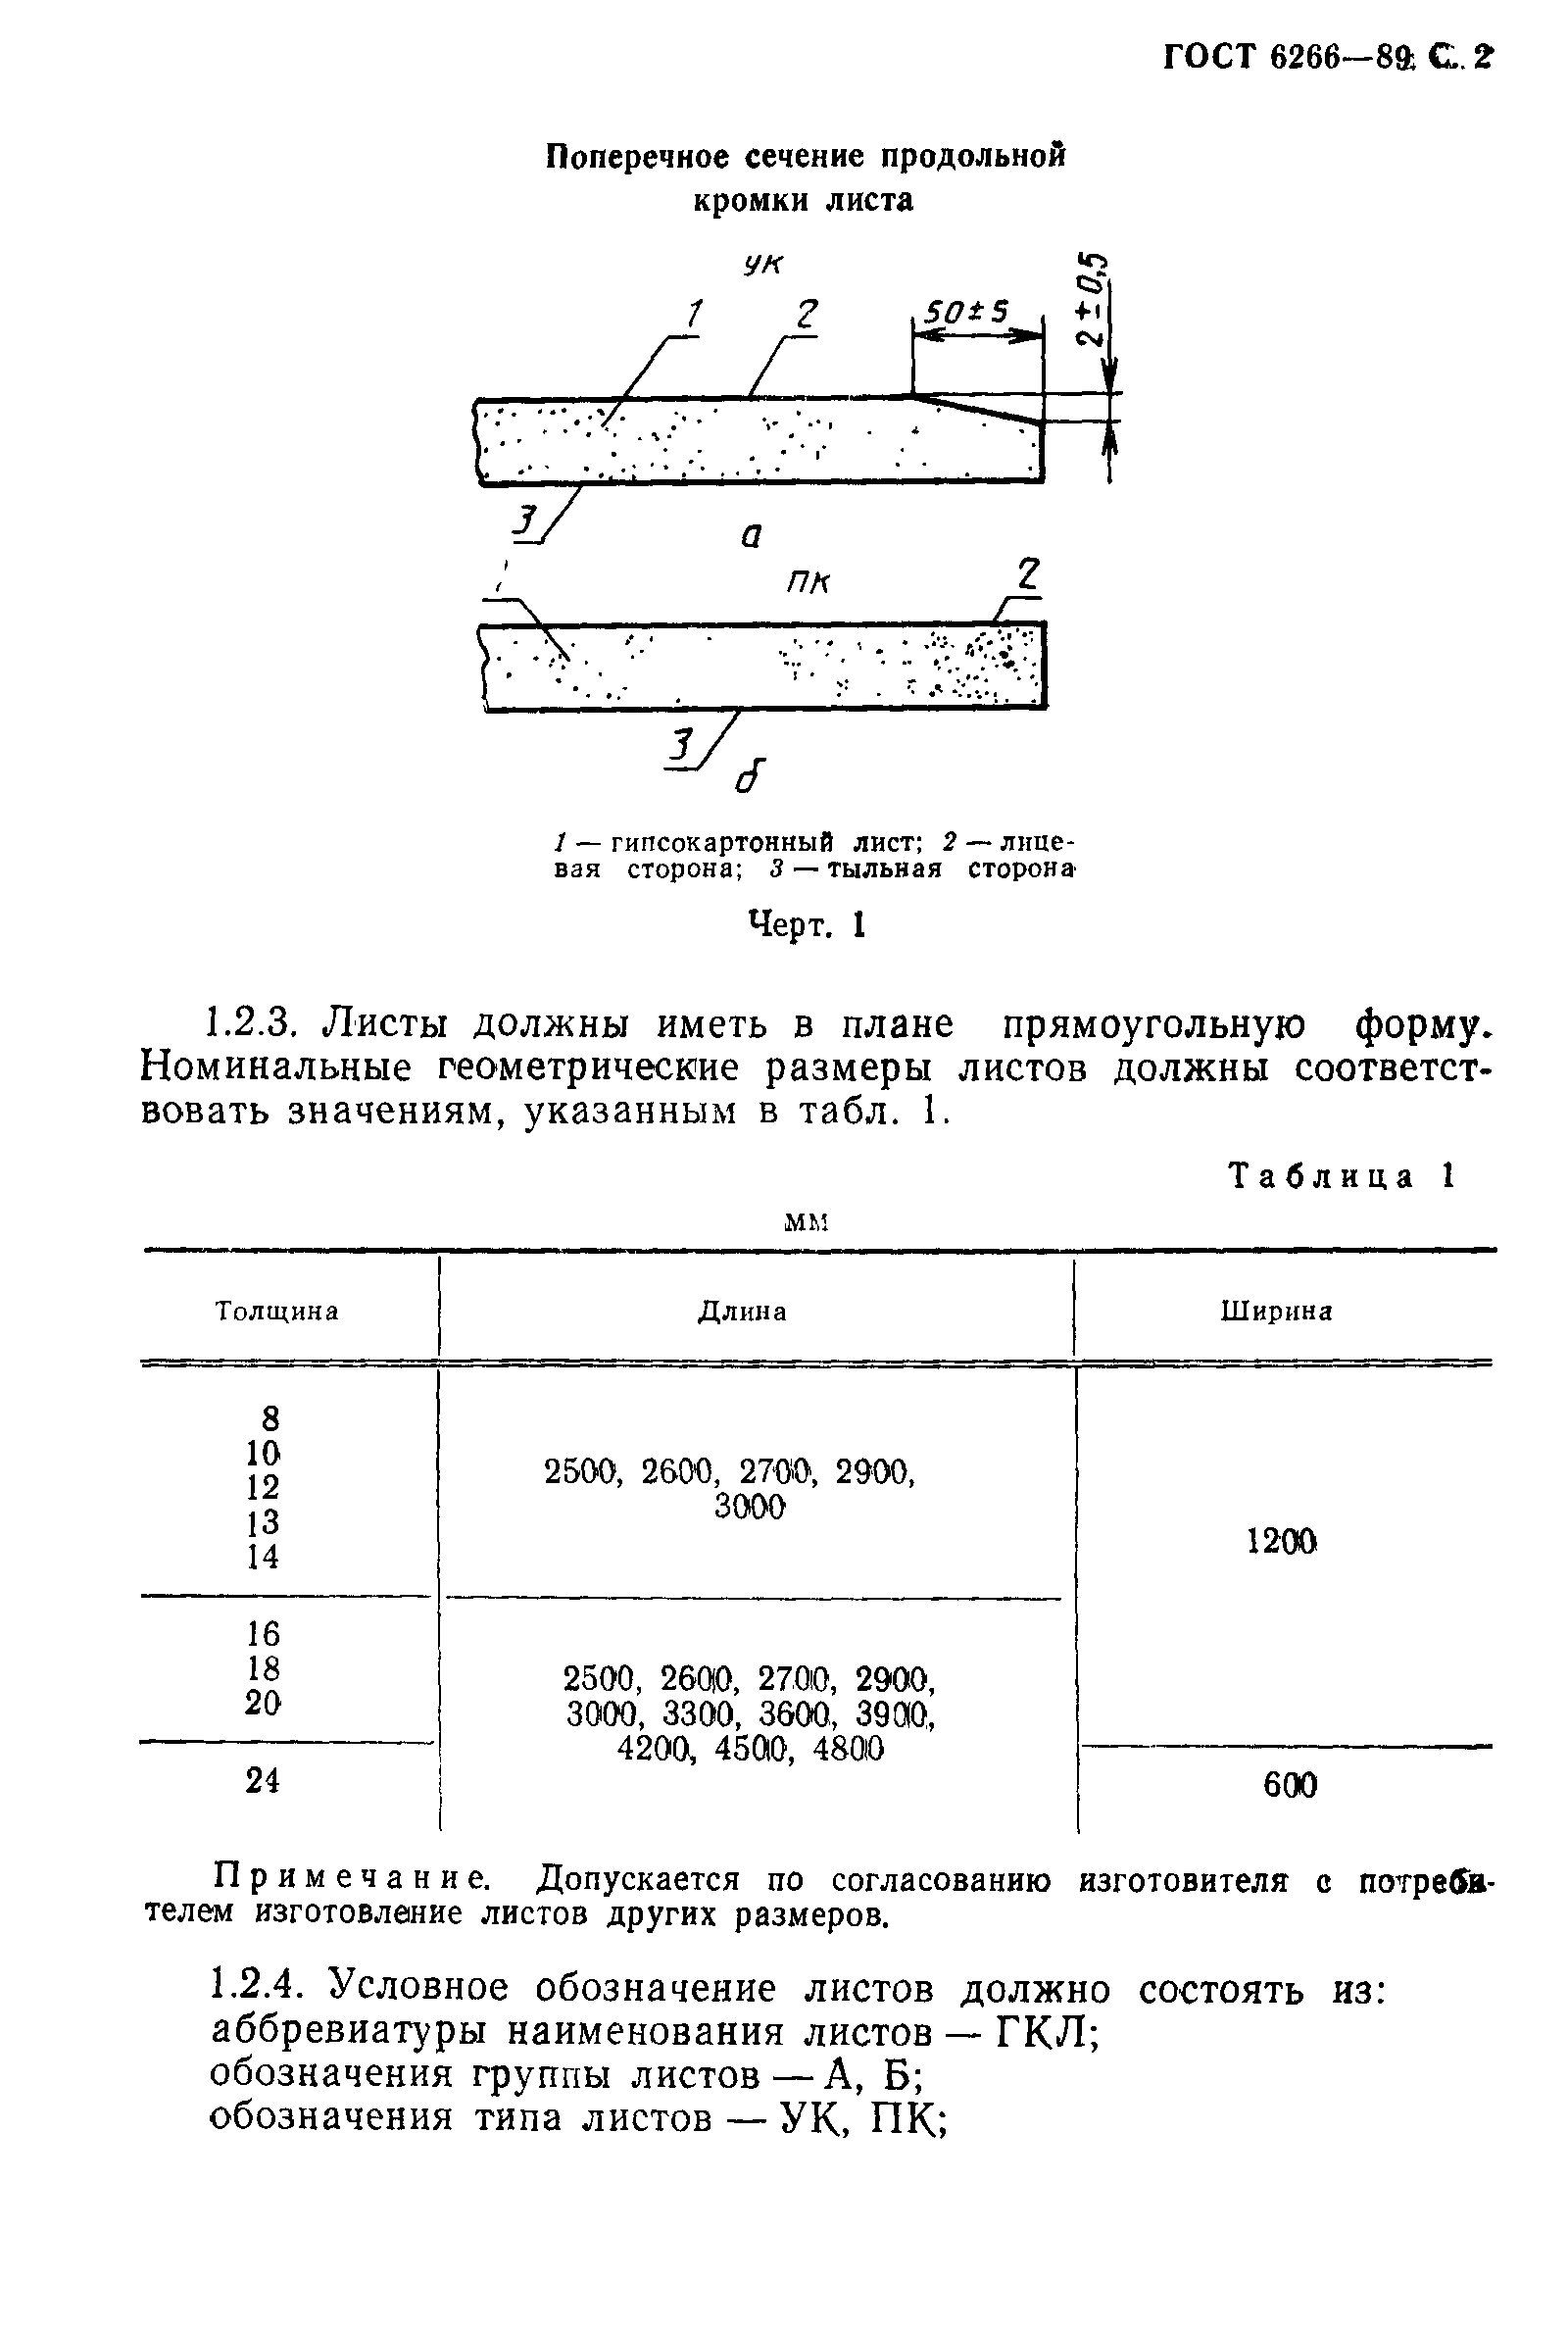 Гост 6266 89